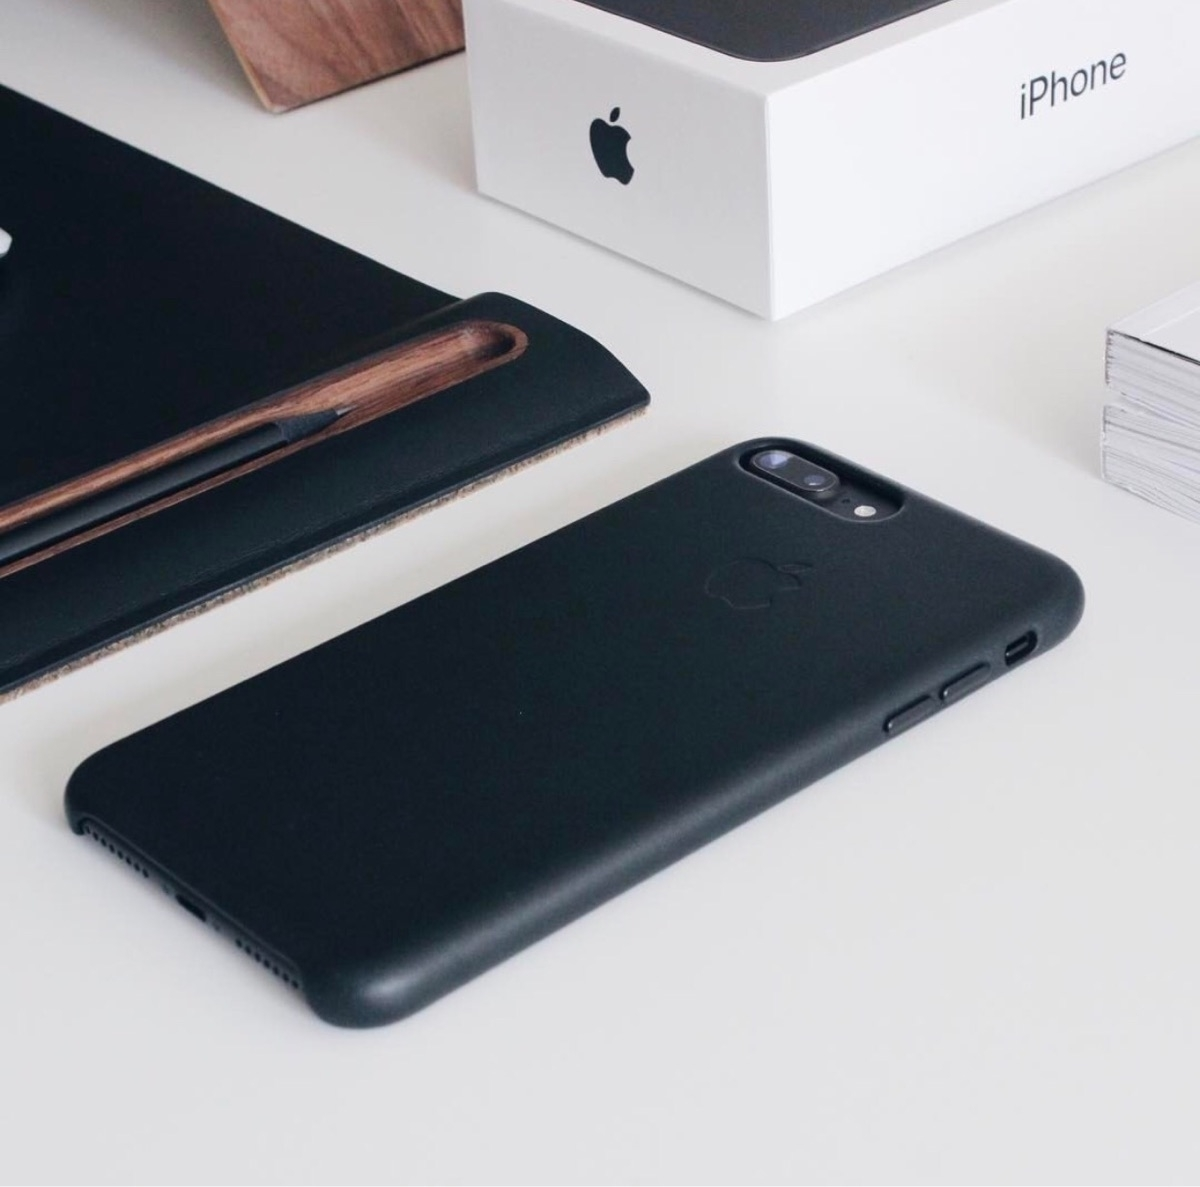 iPhone 7+ Mate black... (produc - edwincanales | ello